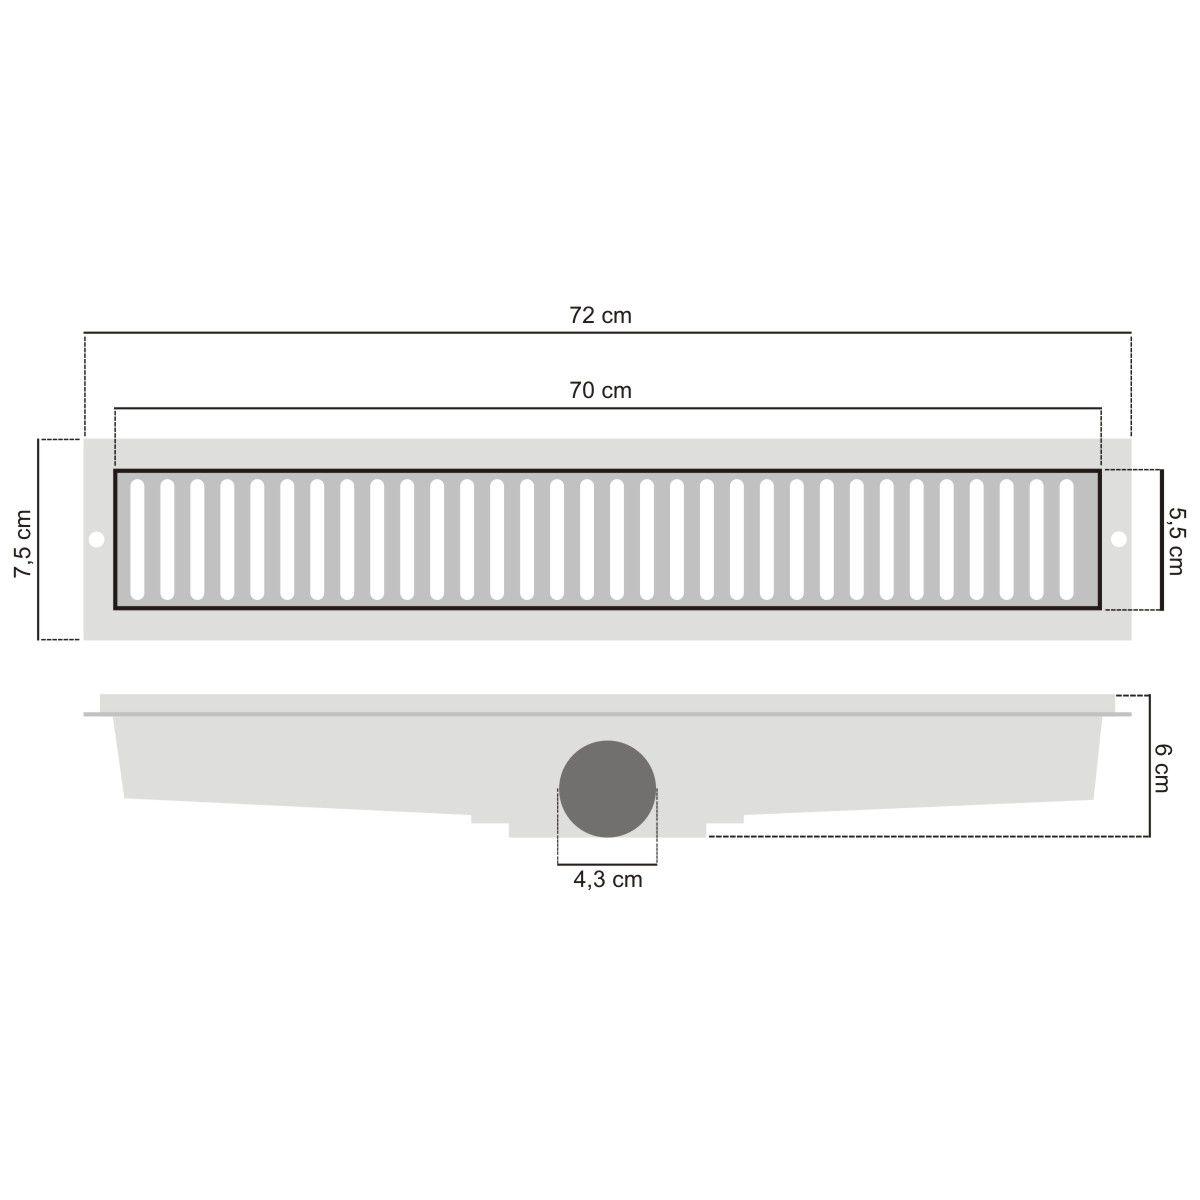 Ralo Linear Inox Perfurada 5x70cm - Lgmais